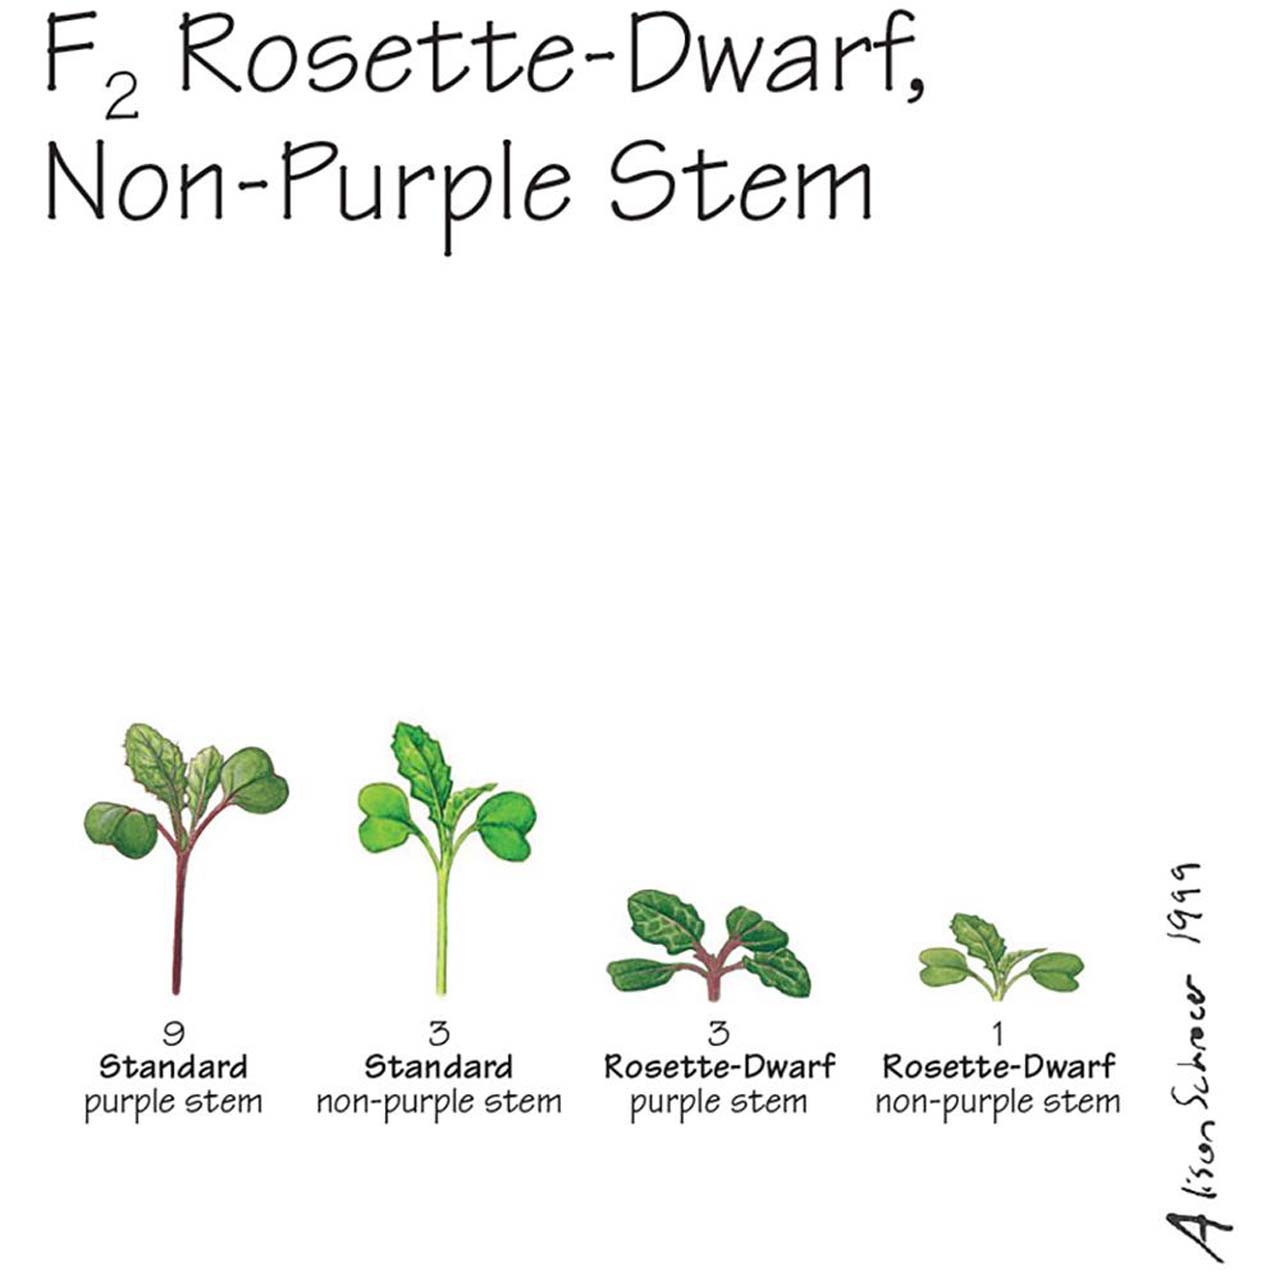 S13.17 - Brassica rapa seeds, F2, rosette-dwarf, non-purple stem